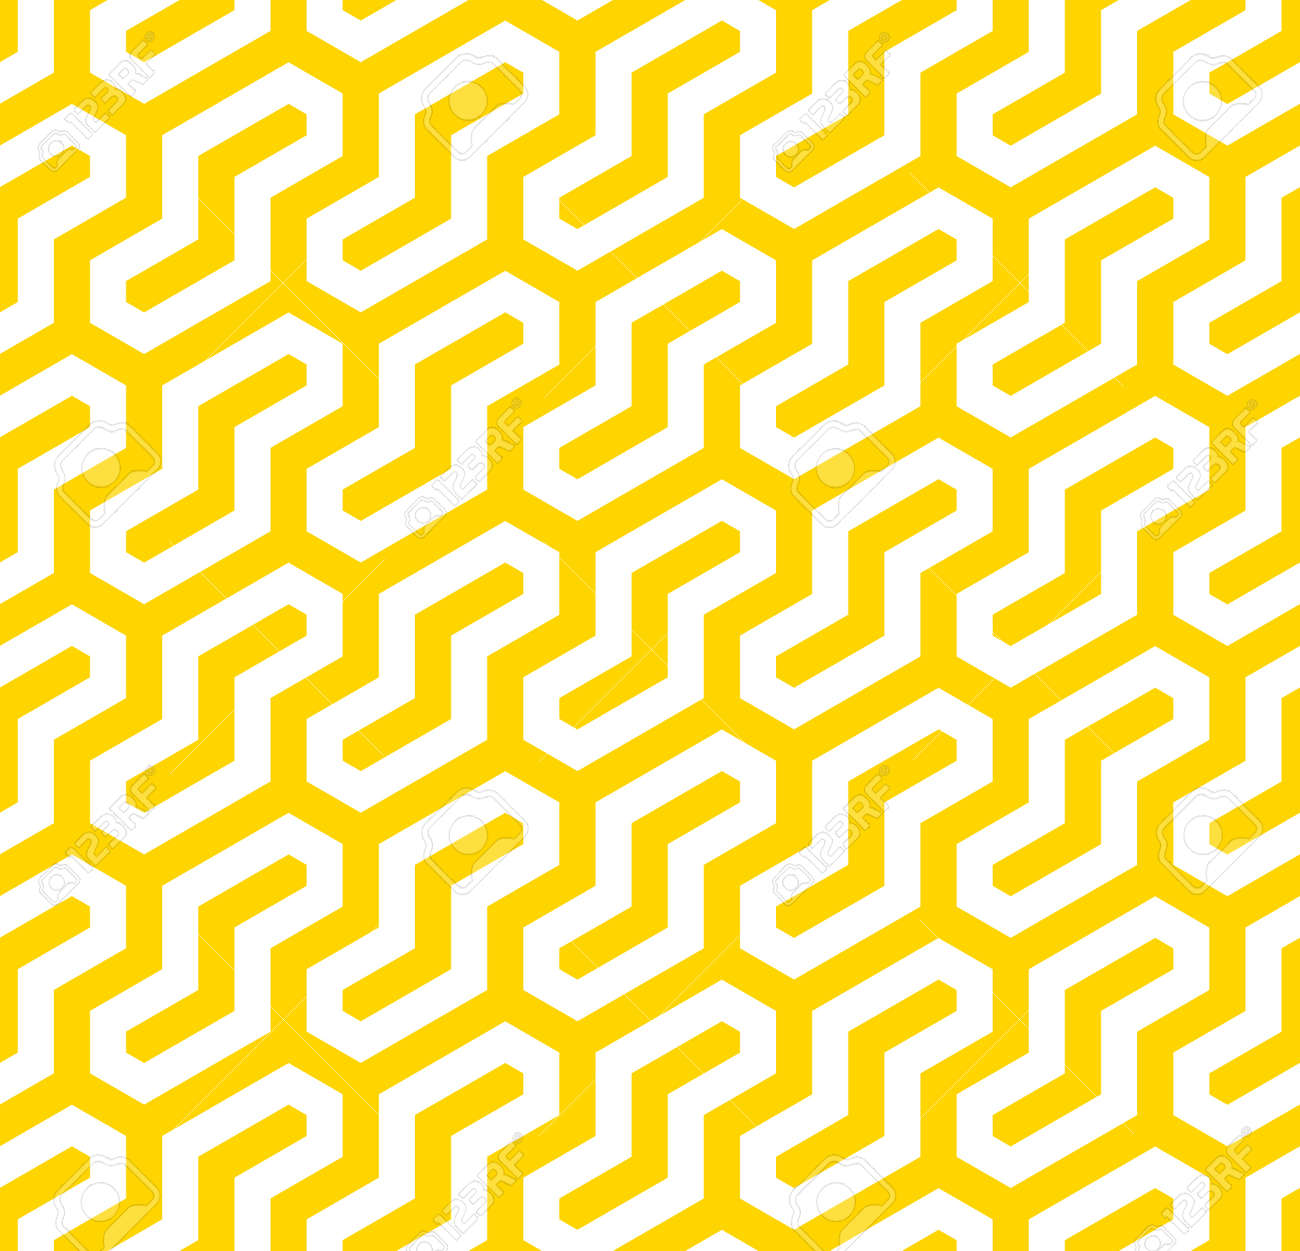 Vector yellow geometric pattern. Seamless modern linear texture. - 145855255